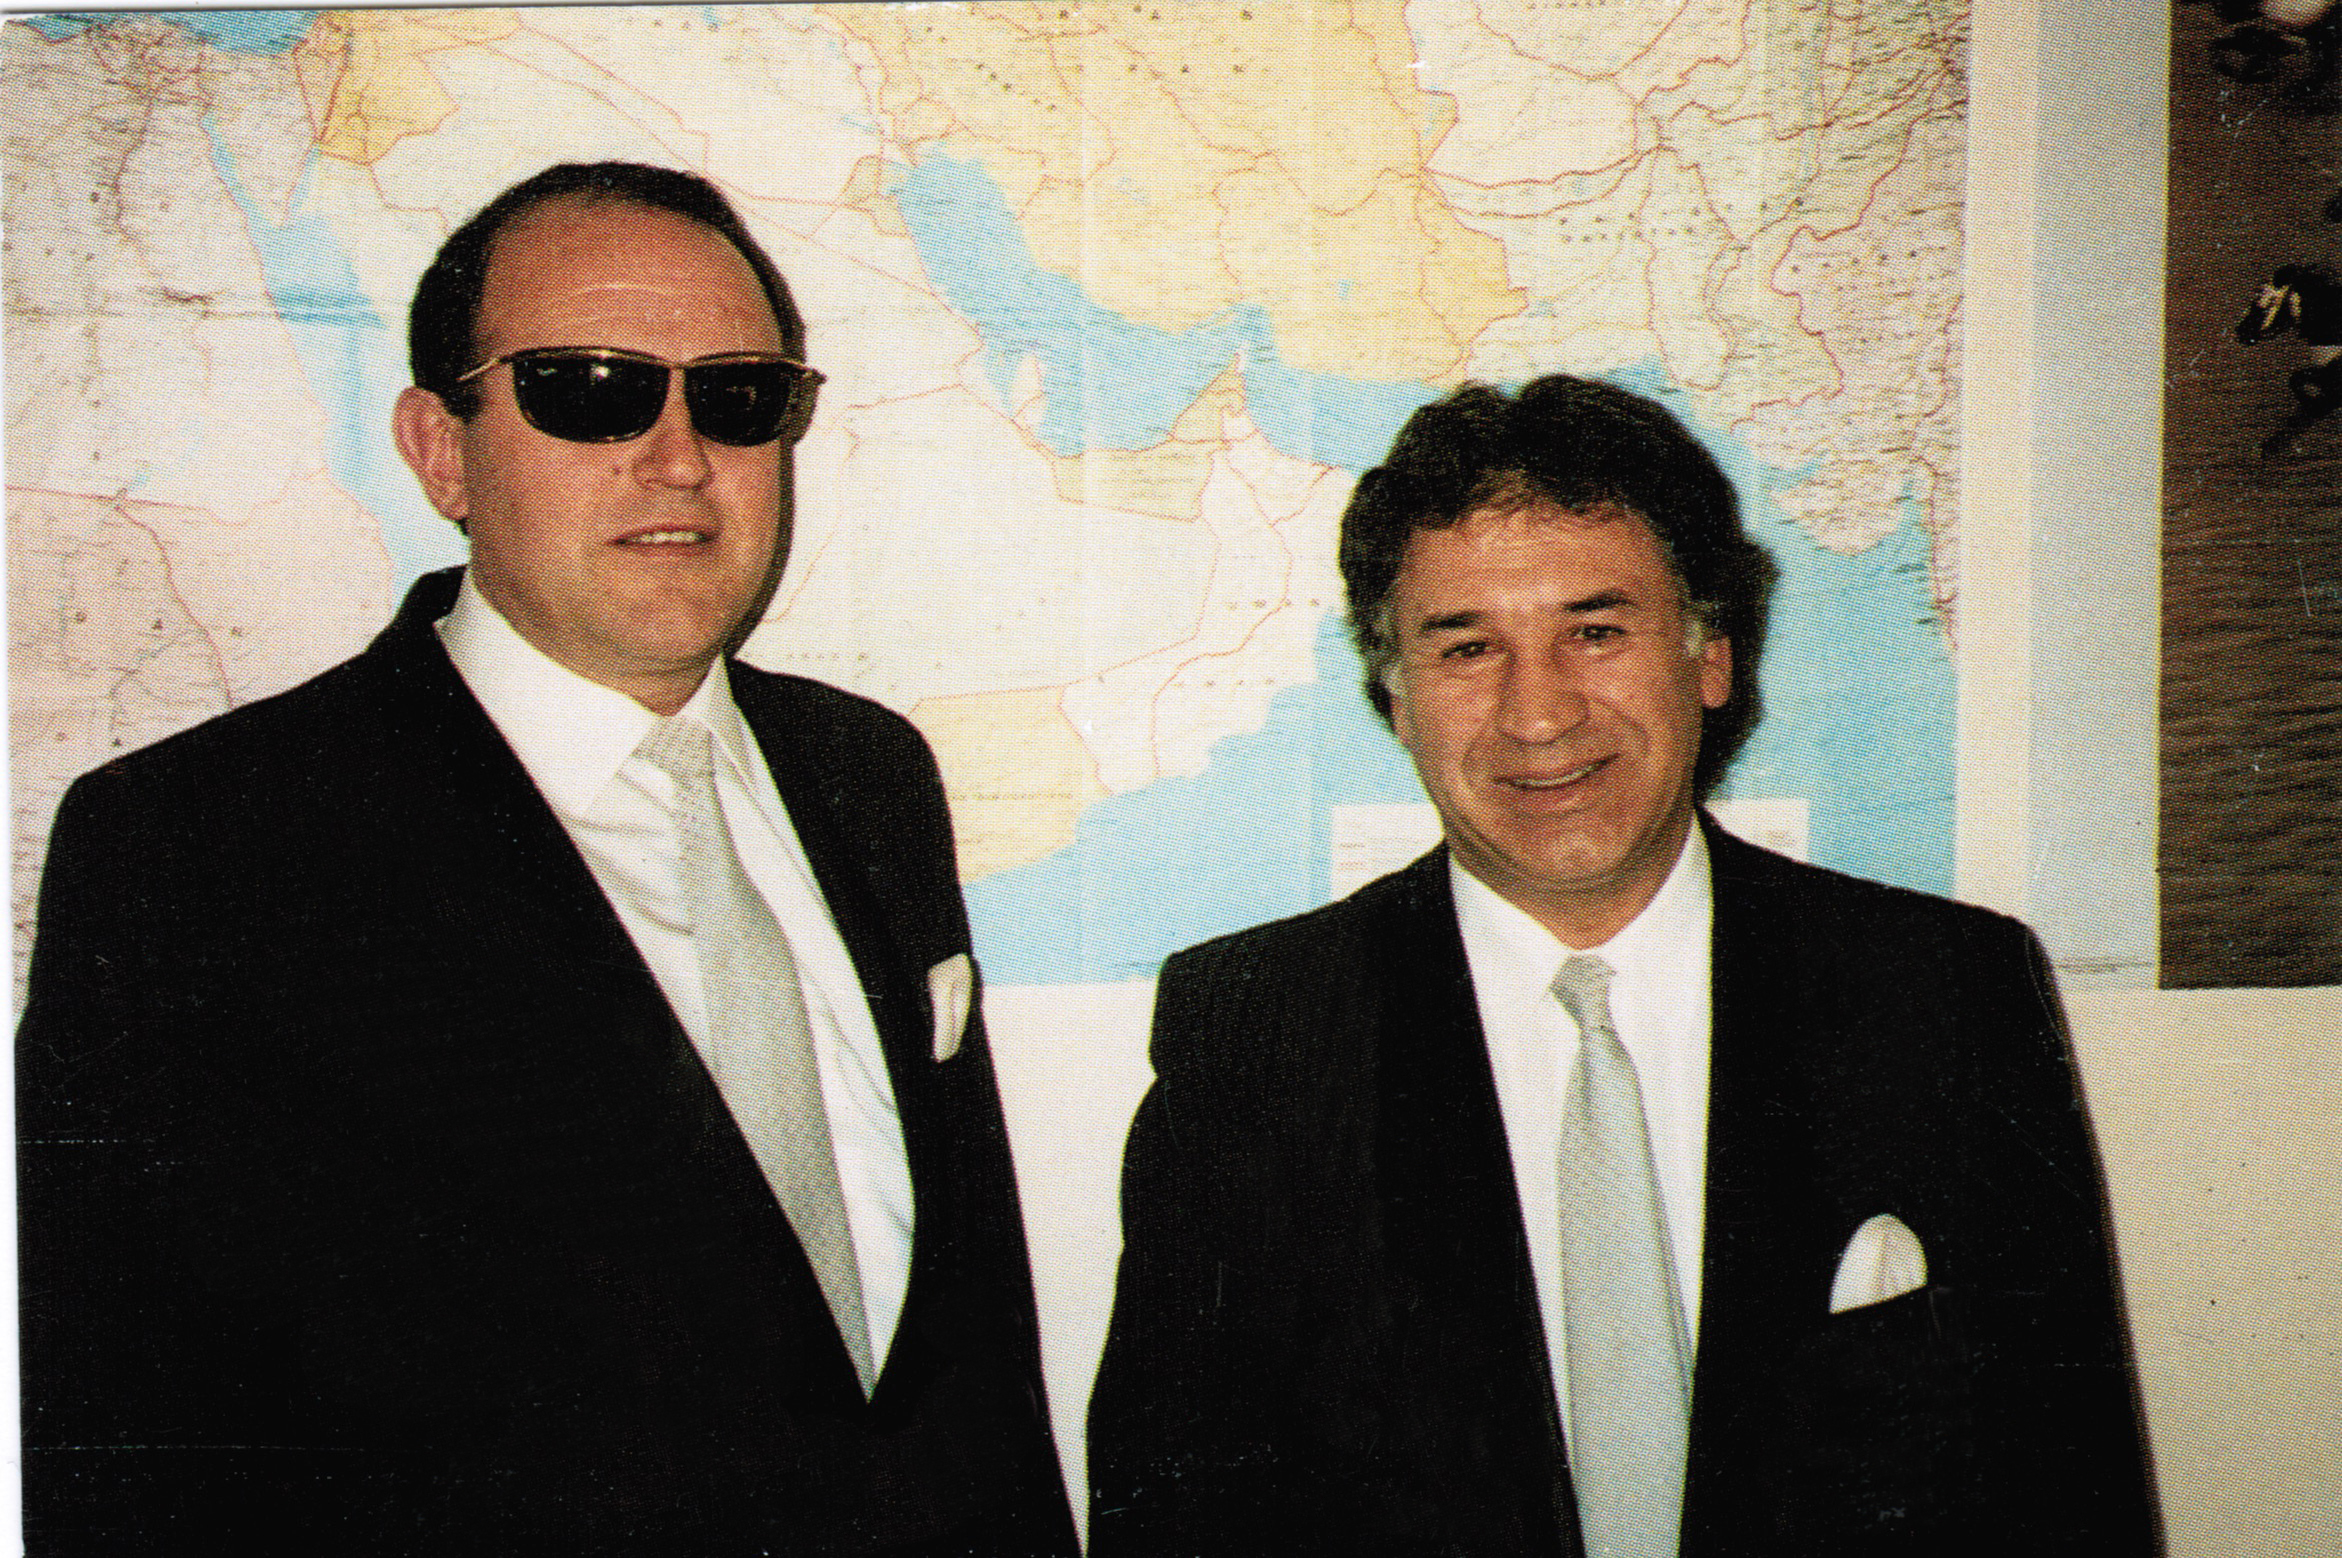 DUO SAN REMO 1993